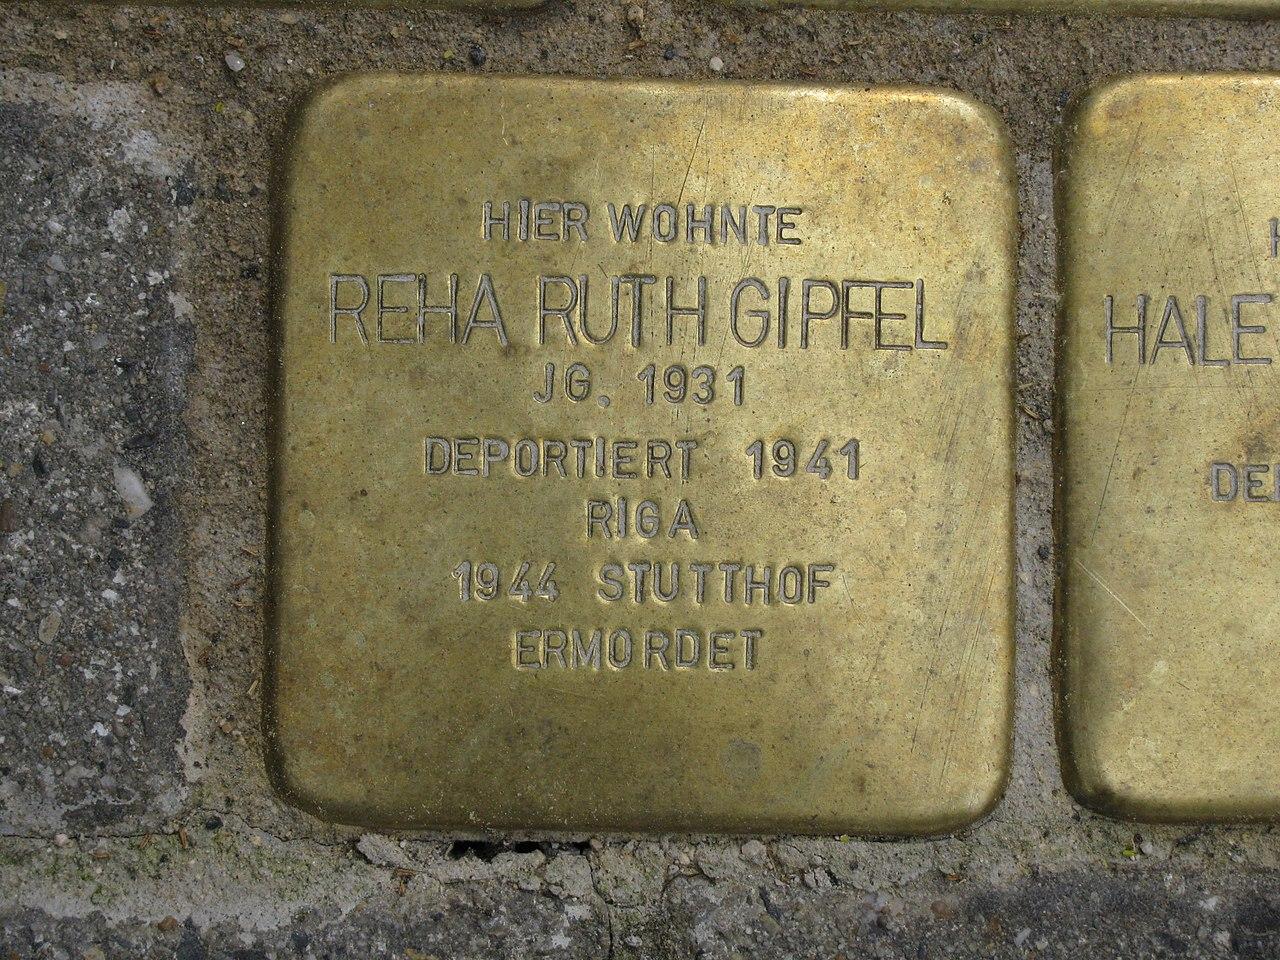 Stolperstein Reha Ruth Gipfel, 1, Untere Königsstraße 86, Wesertor, Kassel.jpg